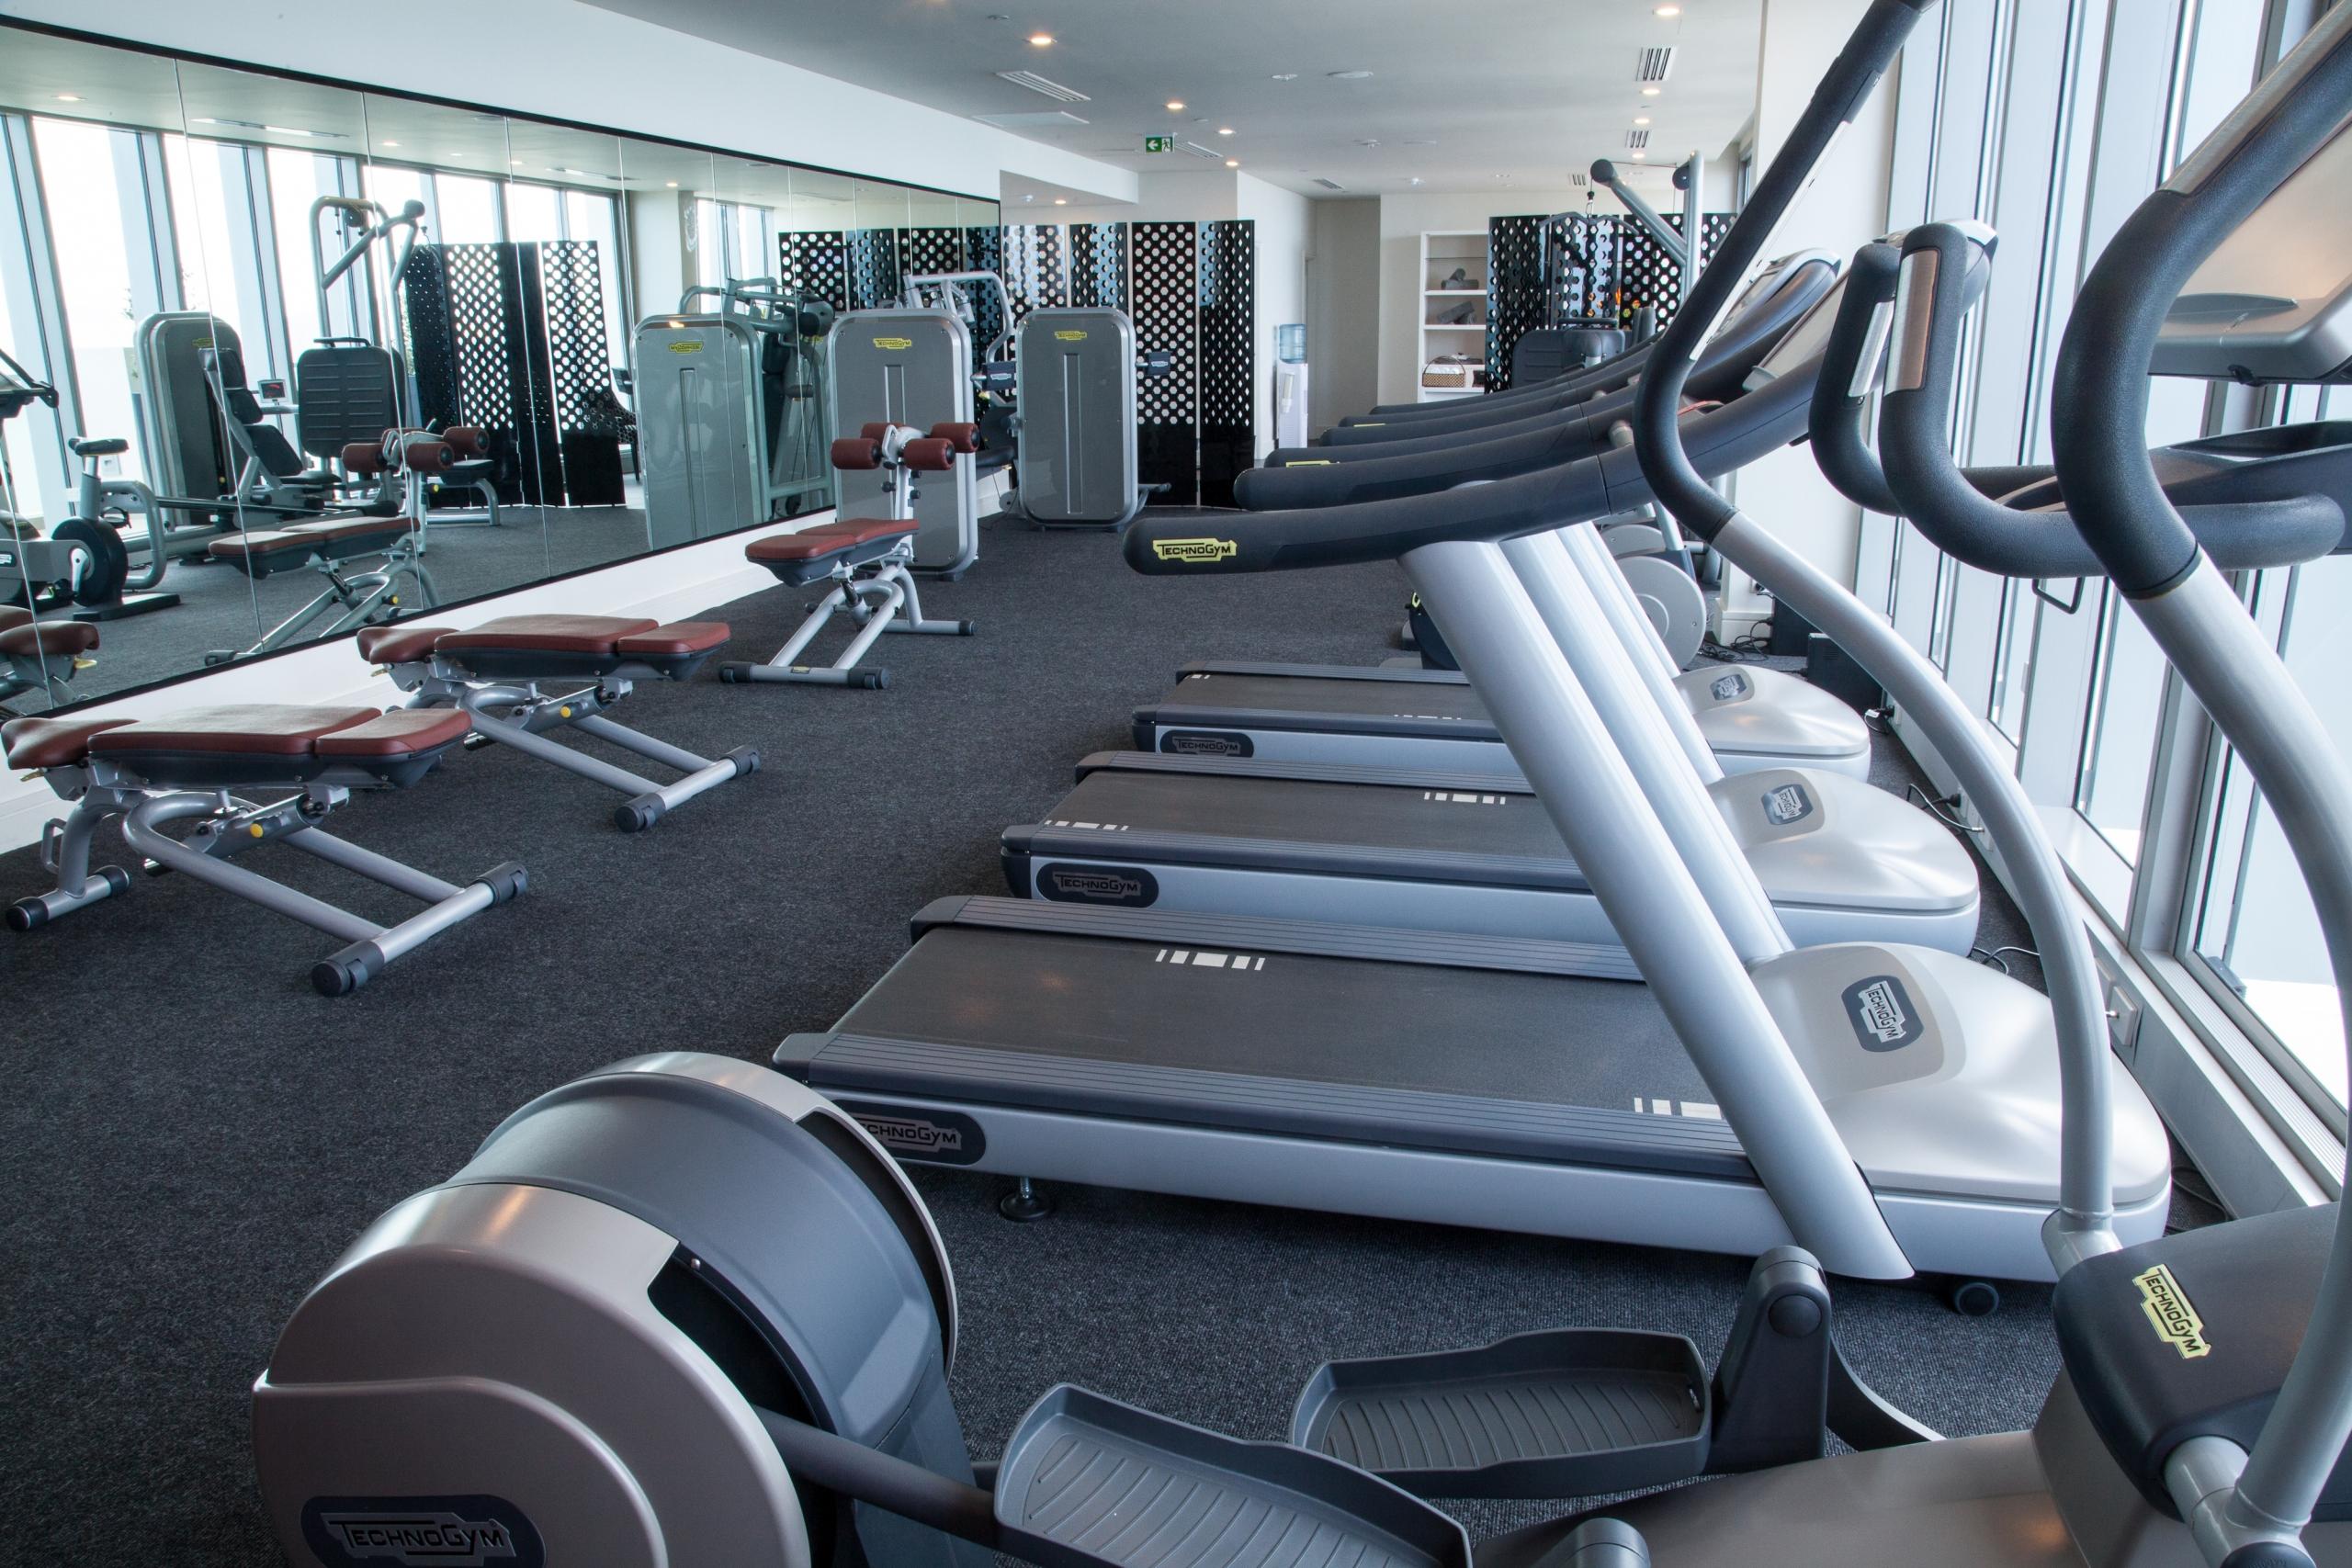 Grand Papua Fitness Centre